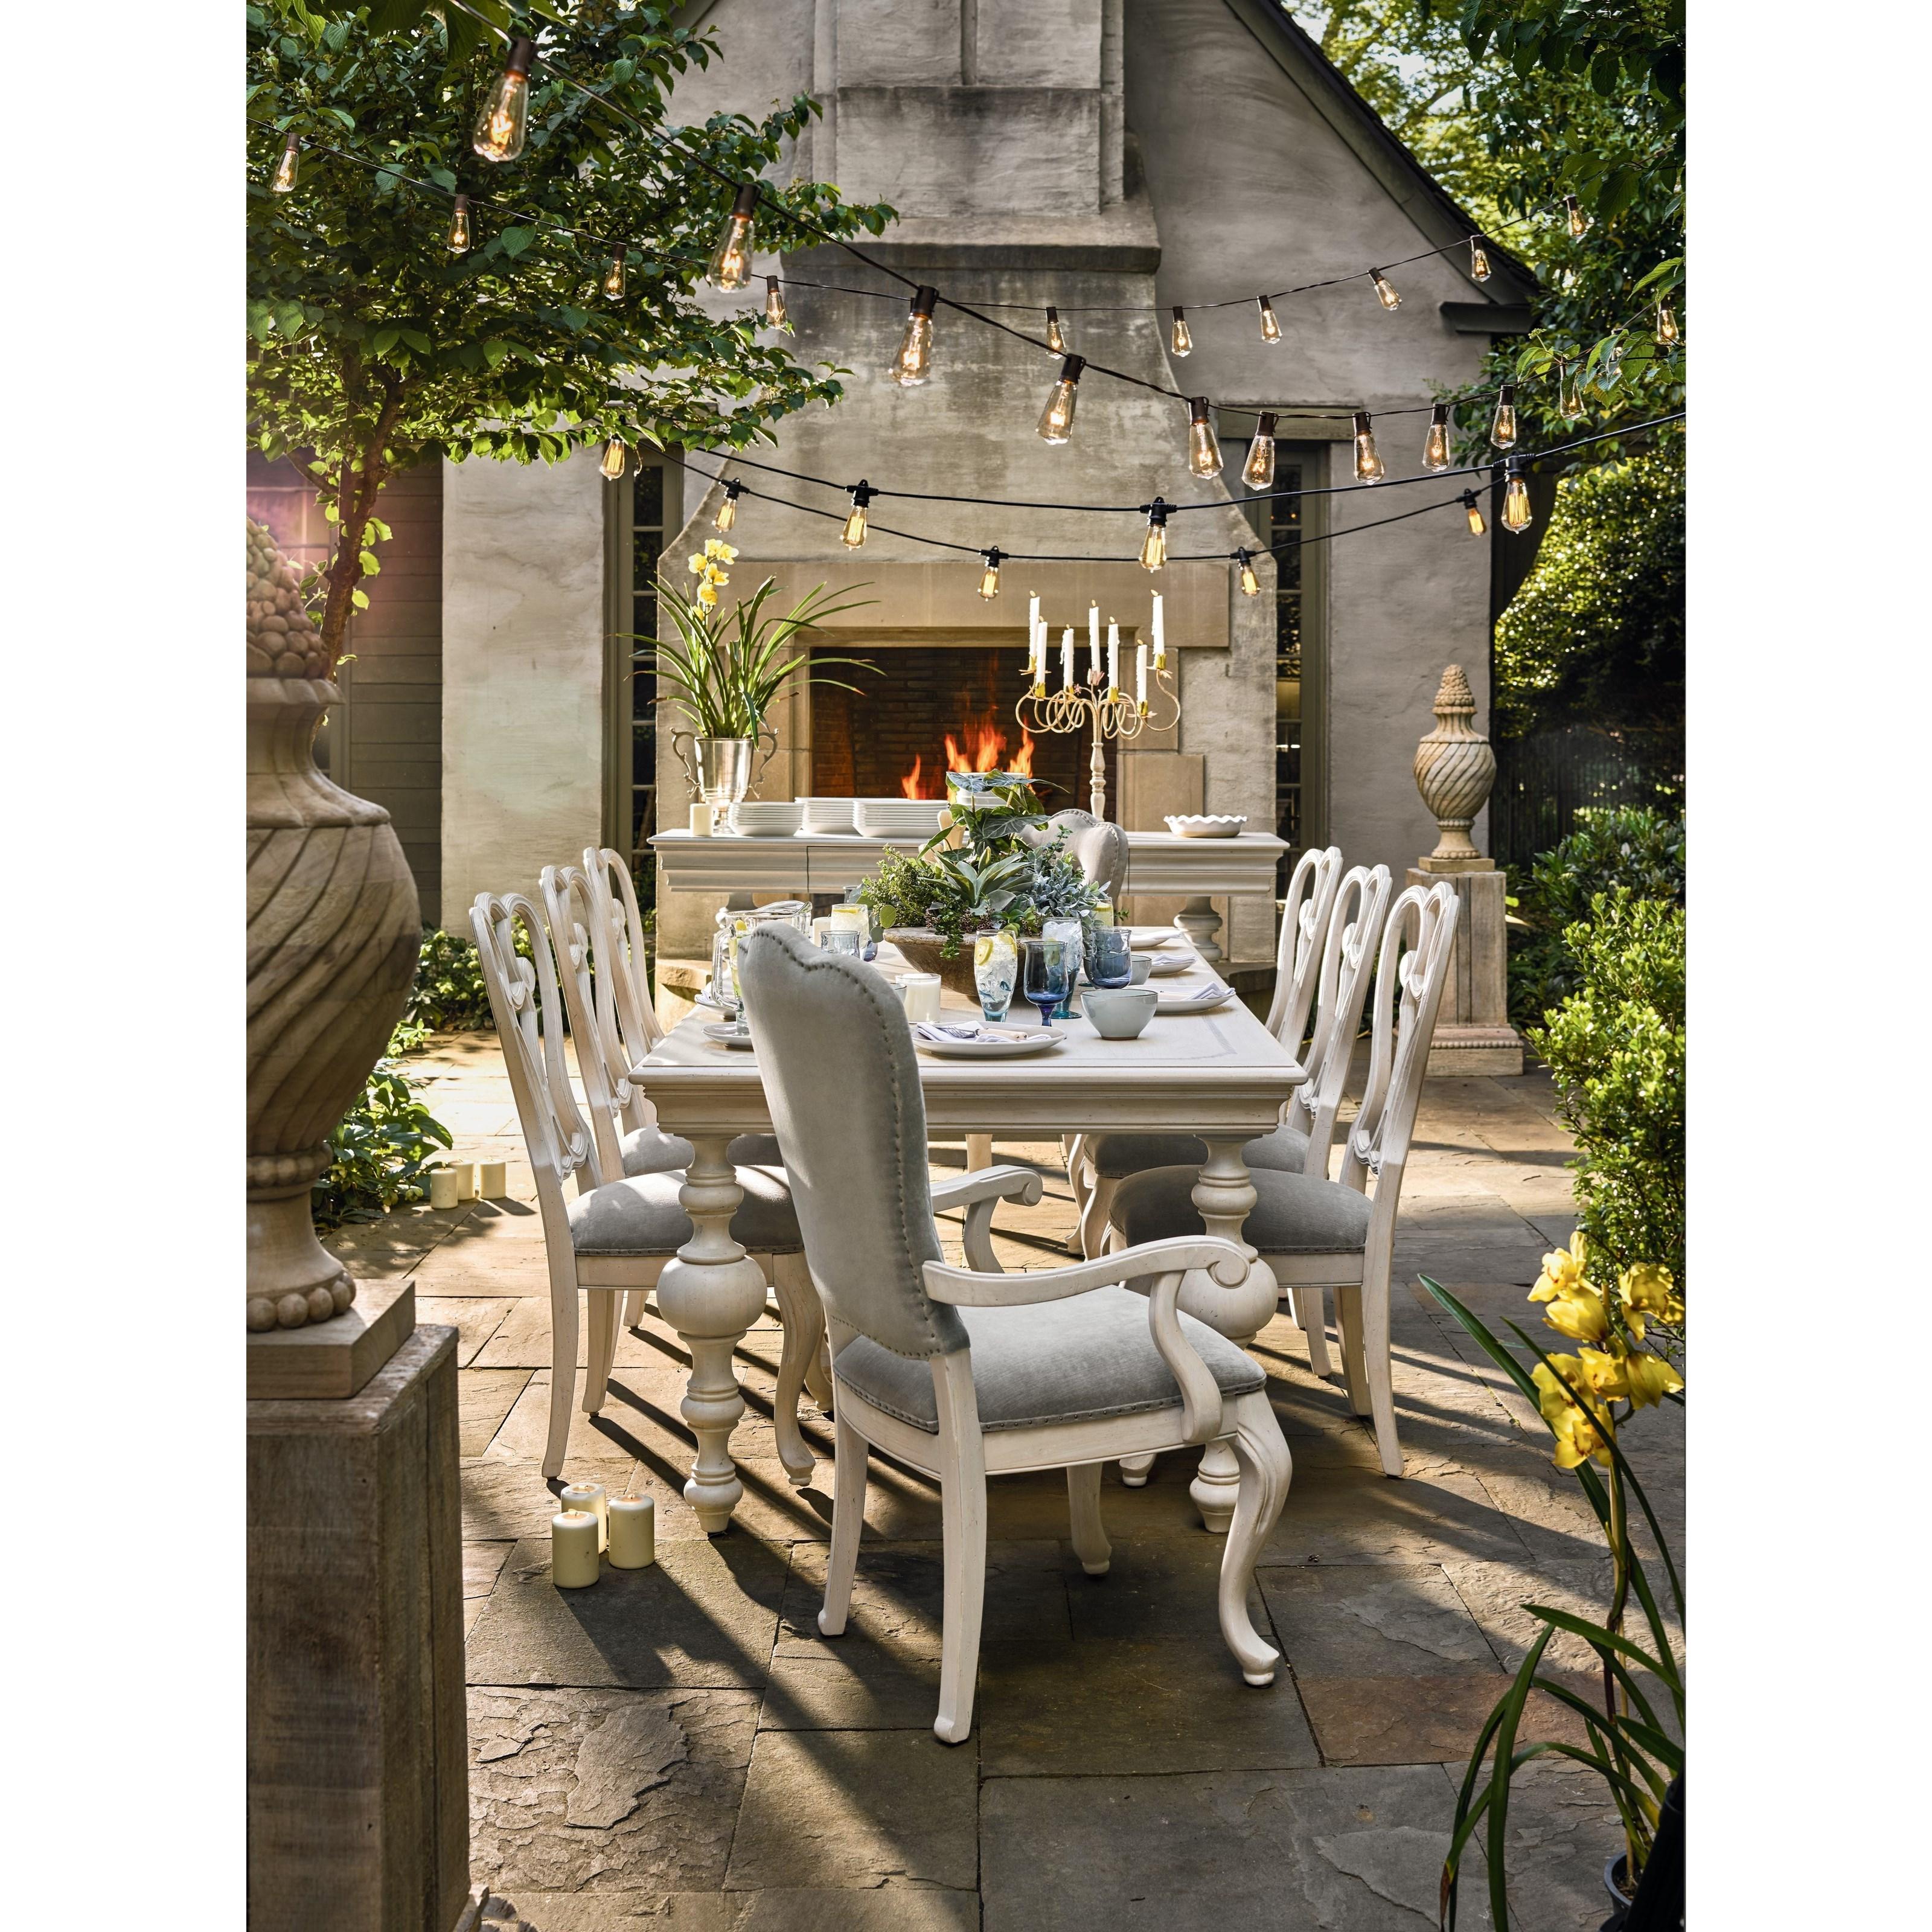 Universal lan traditional formal dining room group with for Traditional formal dining room